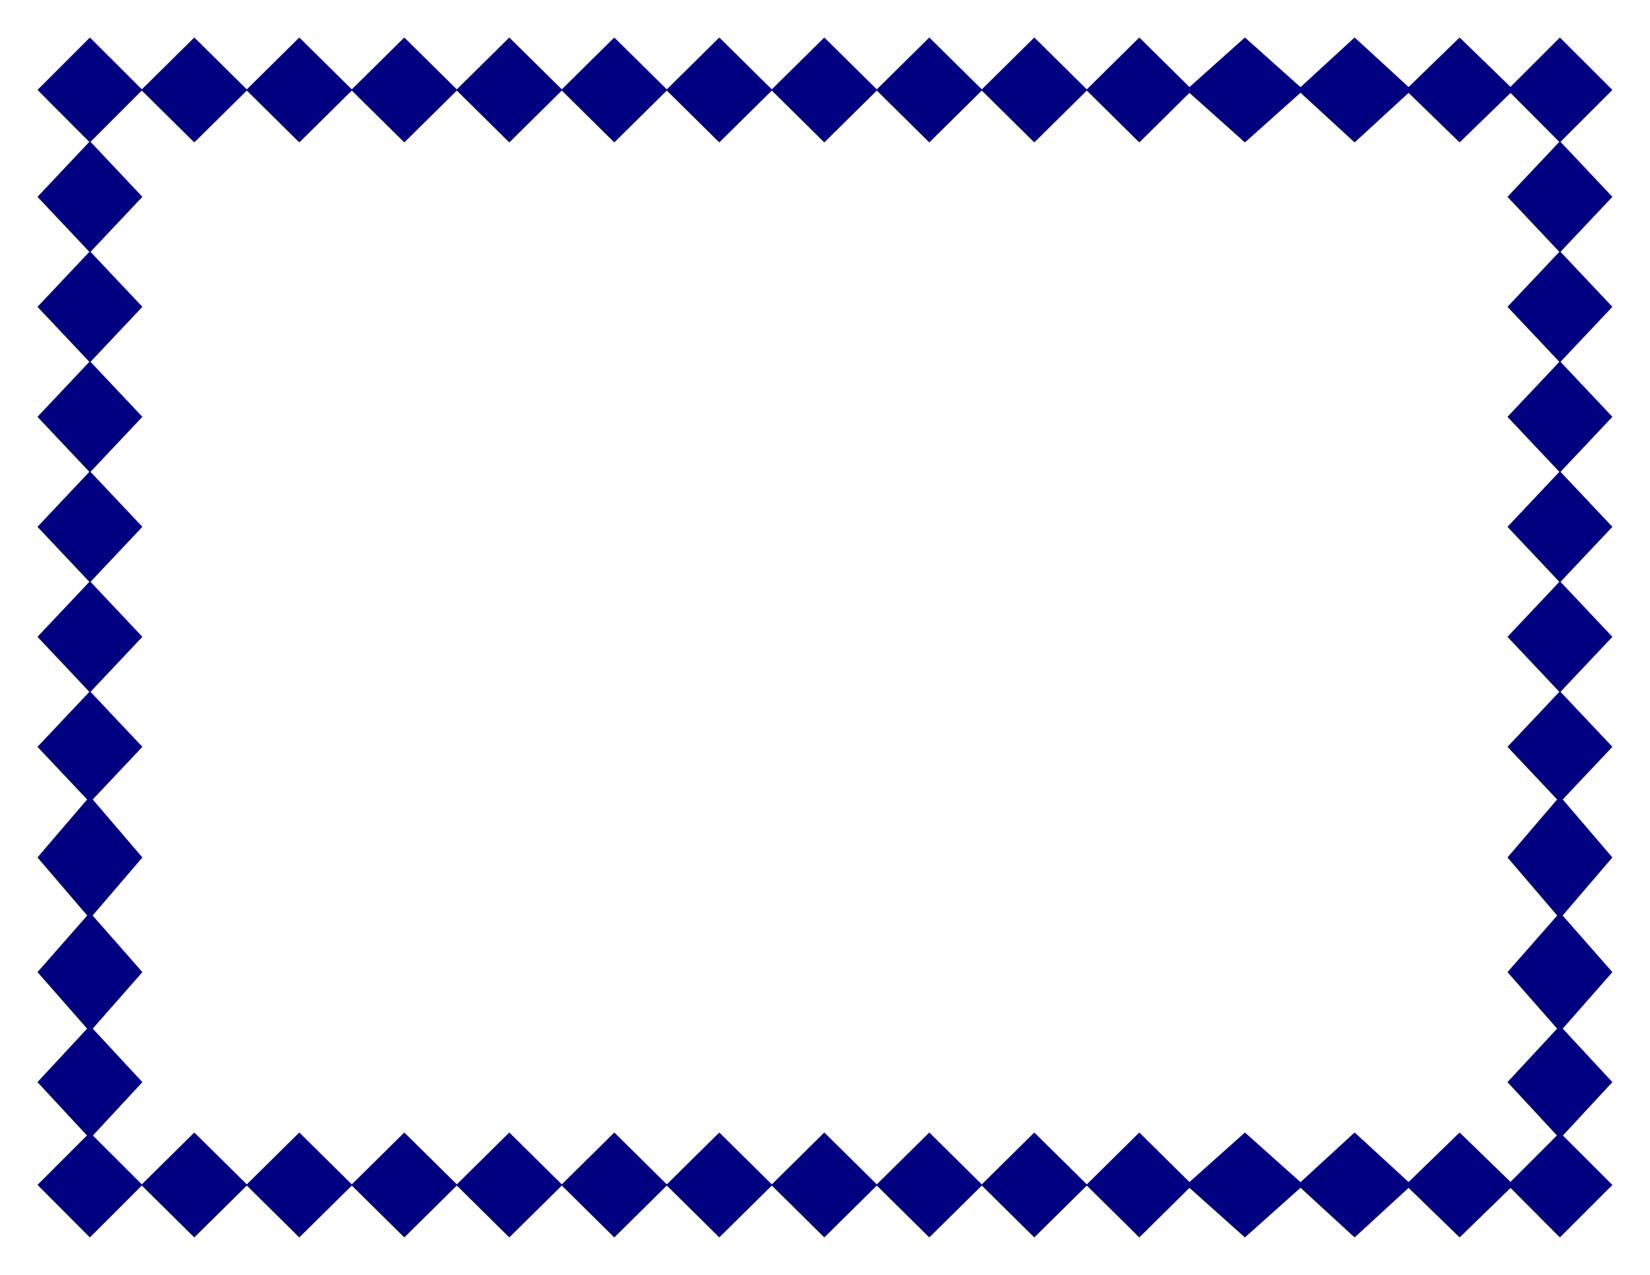 Free Design Cliparts Templates, Download Free Clip Art, Free Clip.